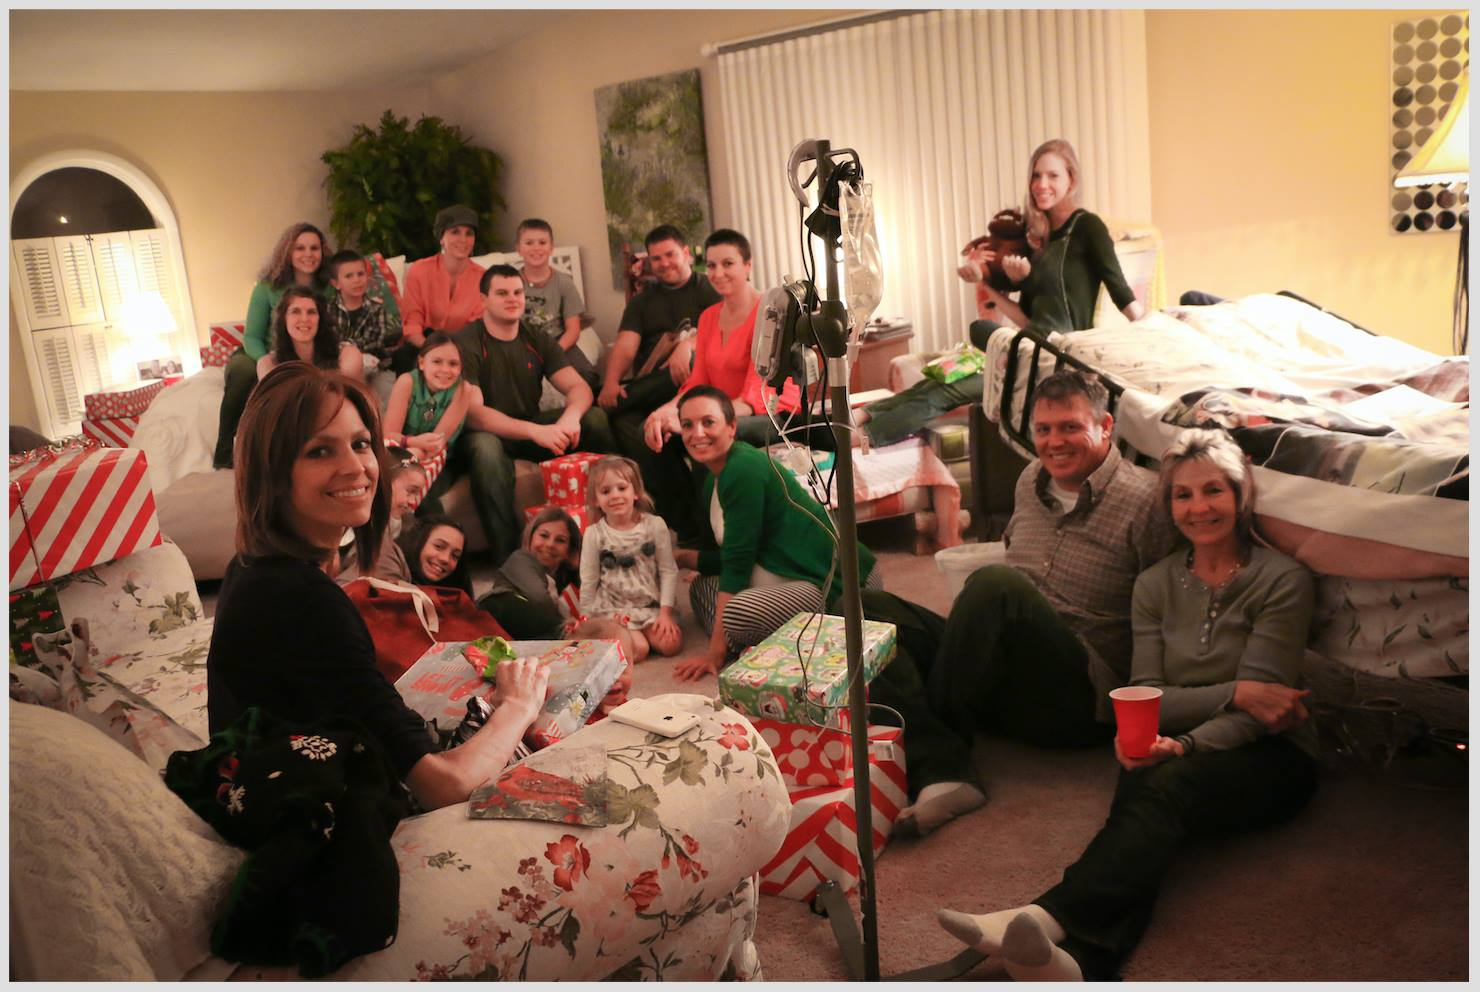 Joey Feek Celebrates Christmas Surrounded By Family | Sounds Like ...